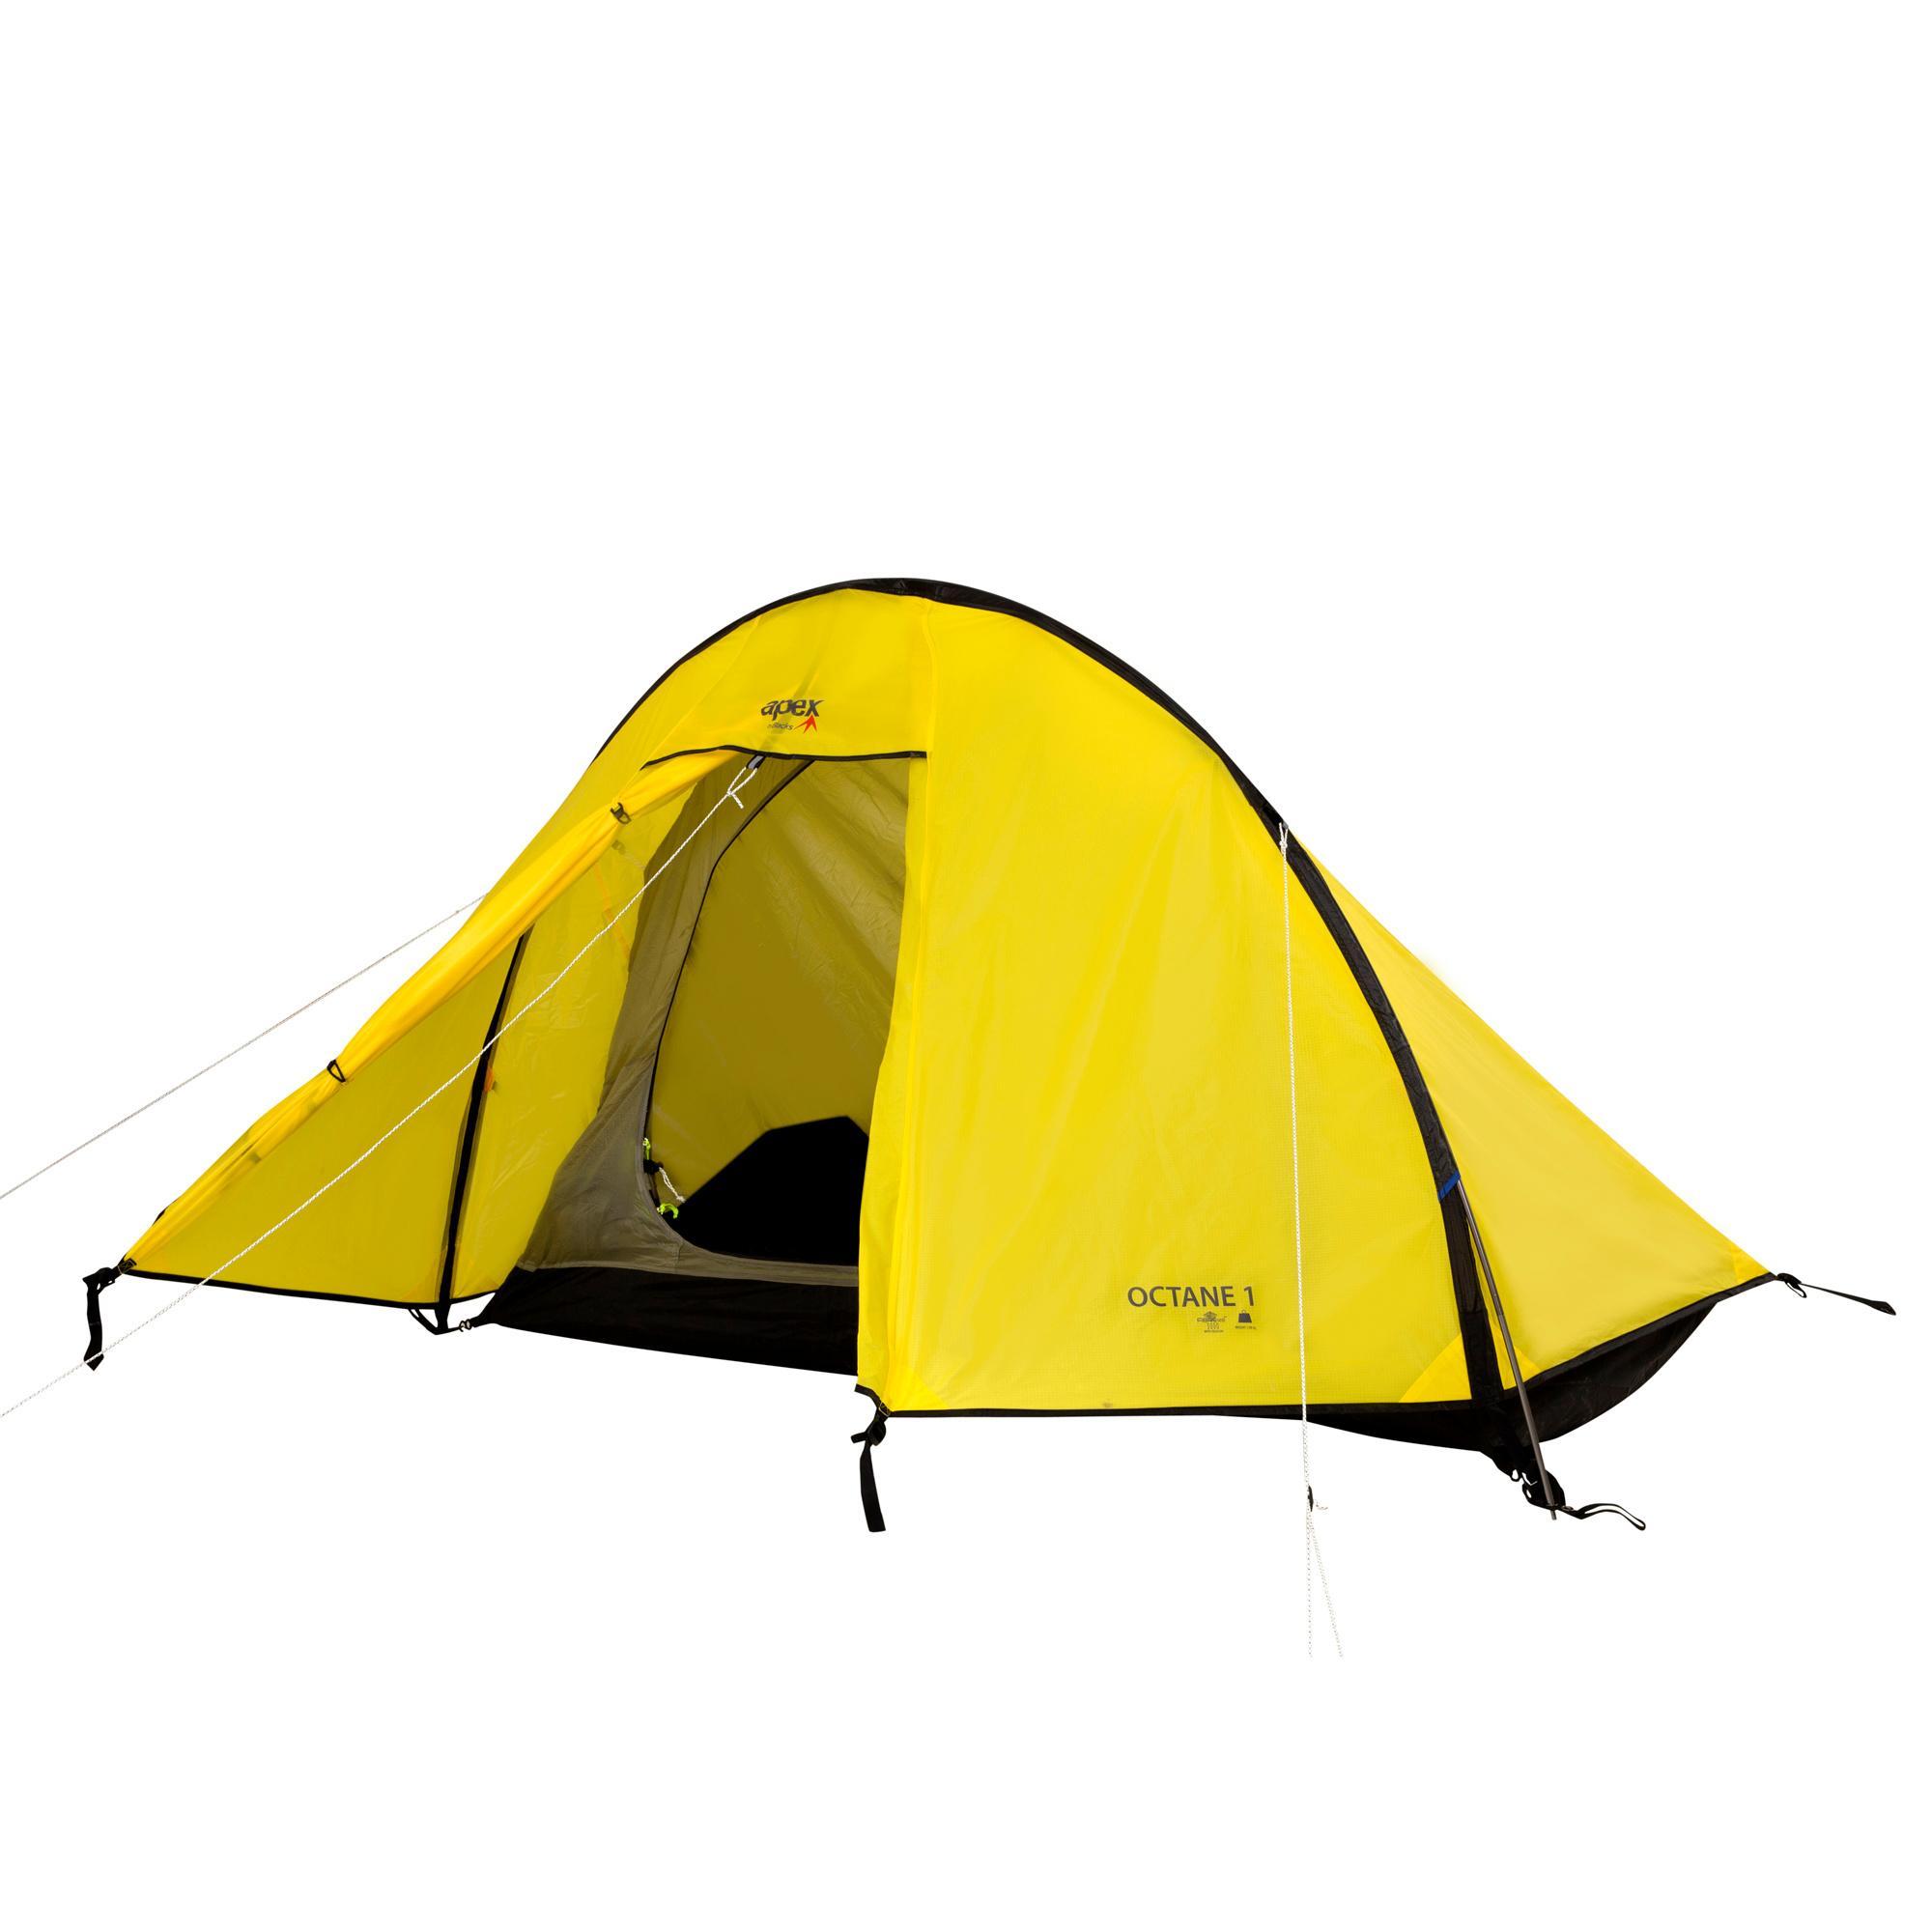 BLACKS Octane 1 Man Tent  sc 1 st  Blacks & BLACKS Octane 1 Man Tent | Blacks